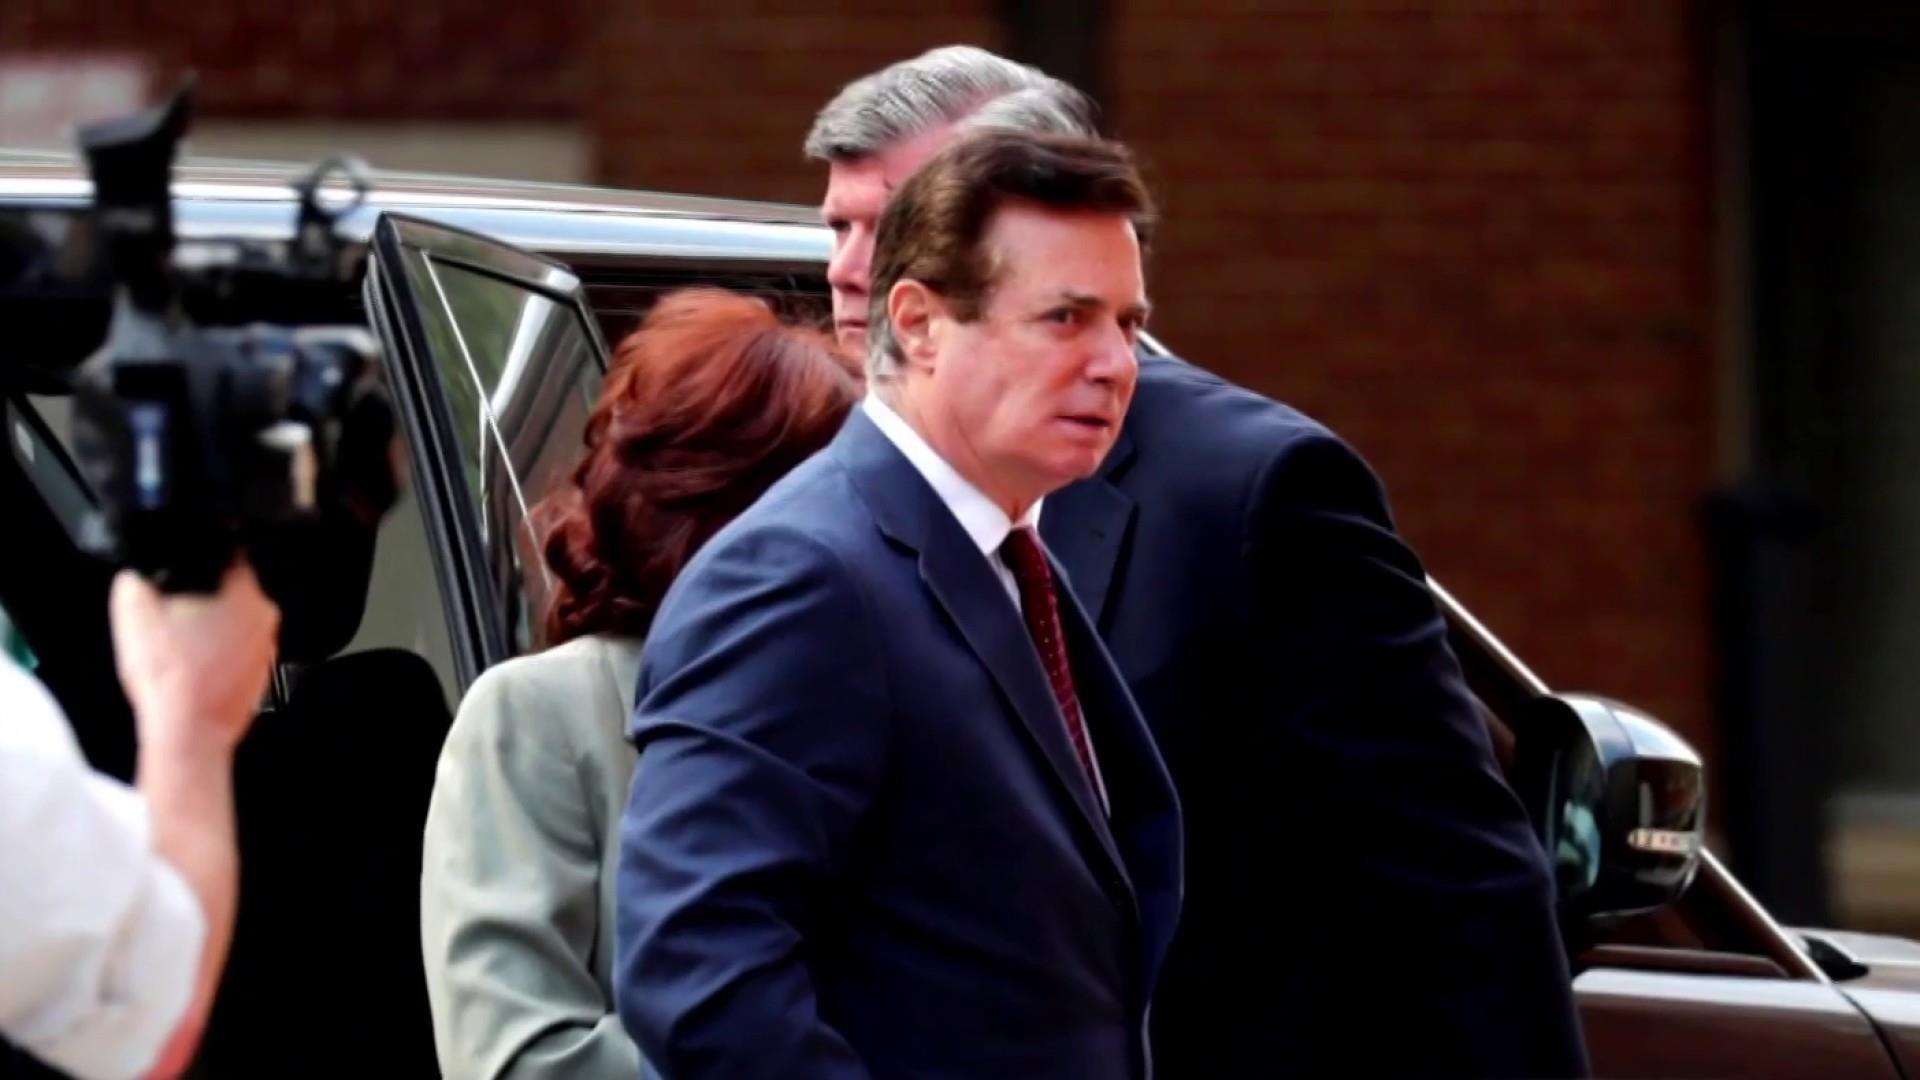 Paul Manafort faces new indictment